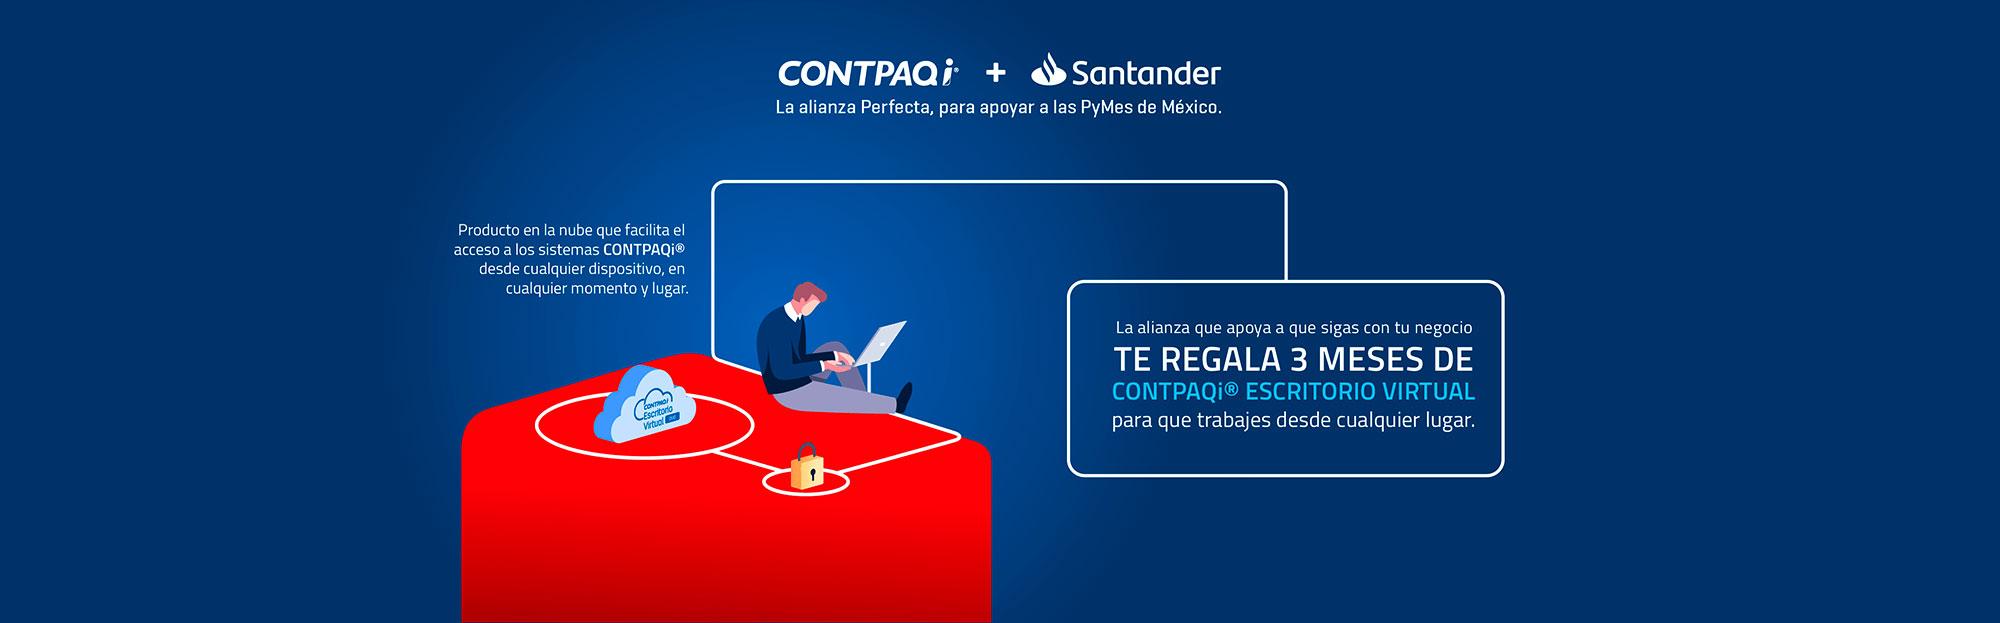 Alianza Contpaqi Santander